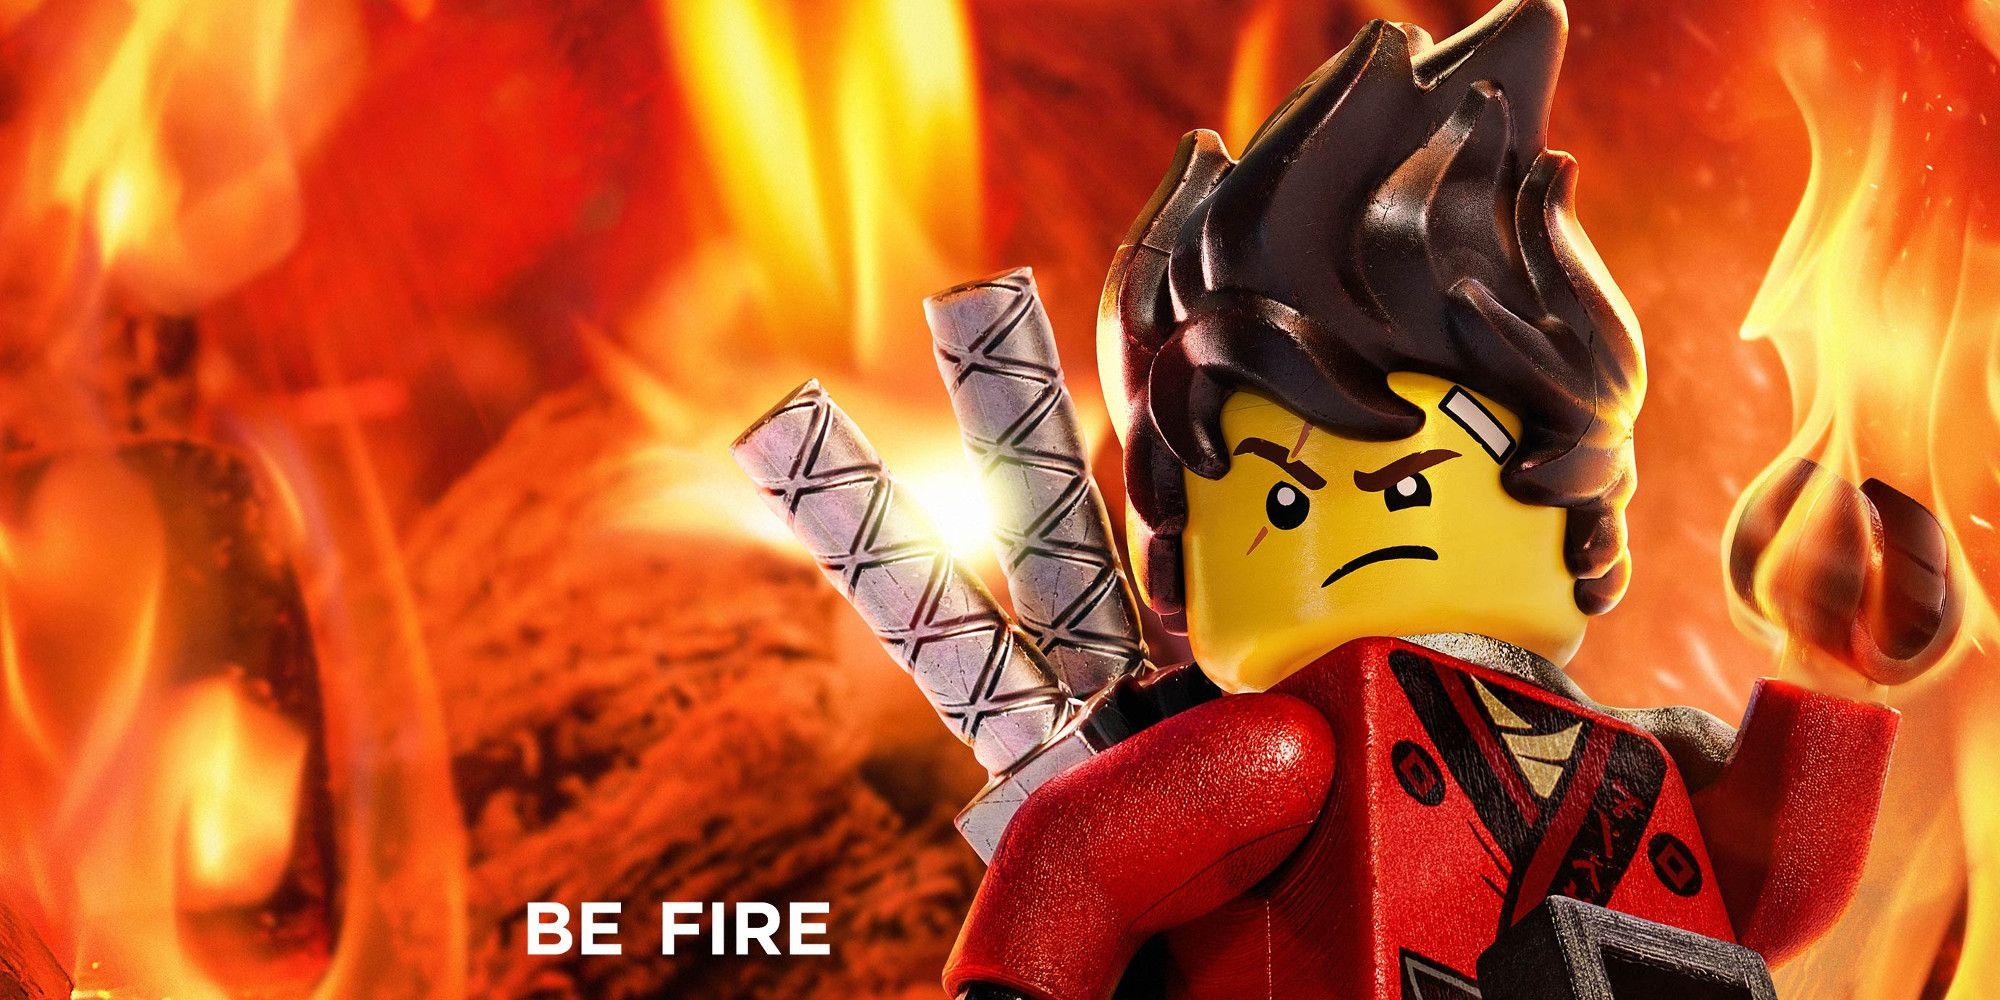 Lego Ninjago Movie Character Postes Screenrant